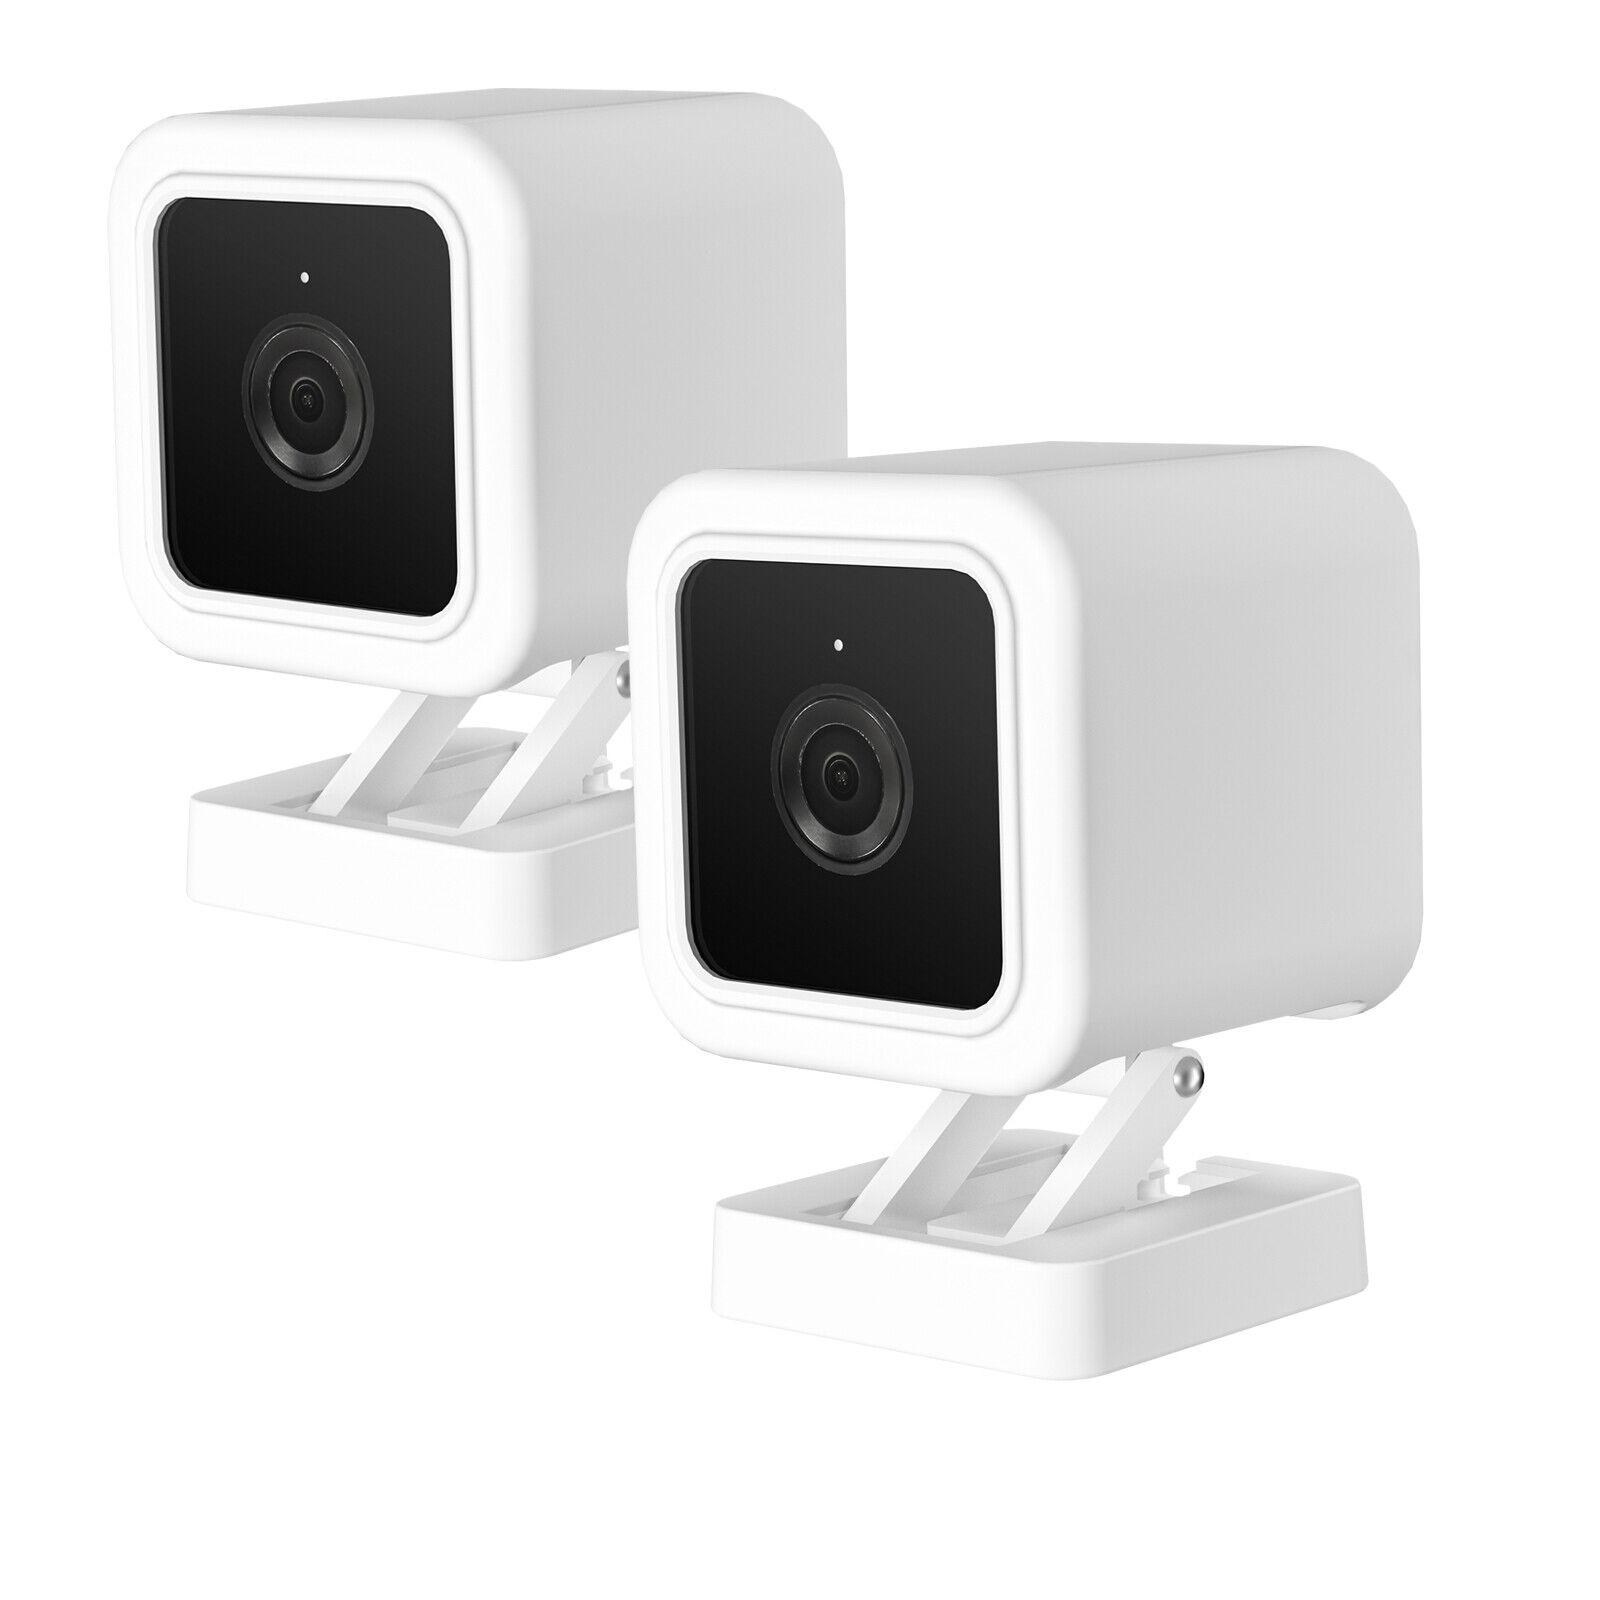 HOLACA Silicone Skin Protective Case/Cover for Wyze Cam v3 Indoor/Outdoor Camera